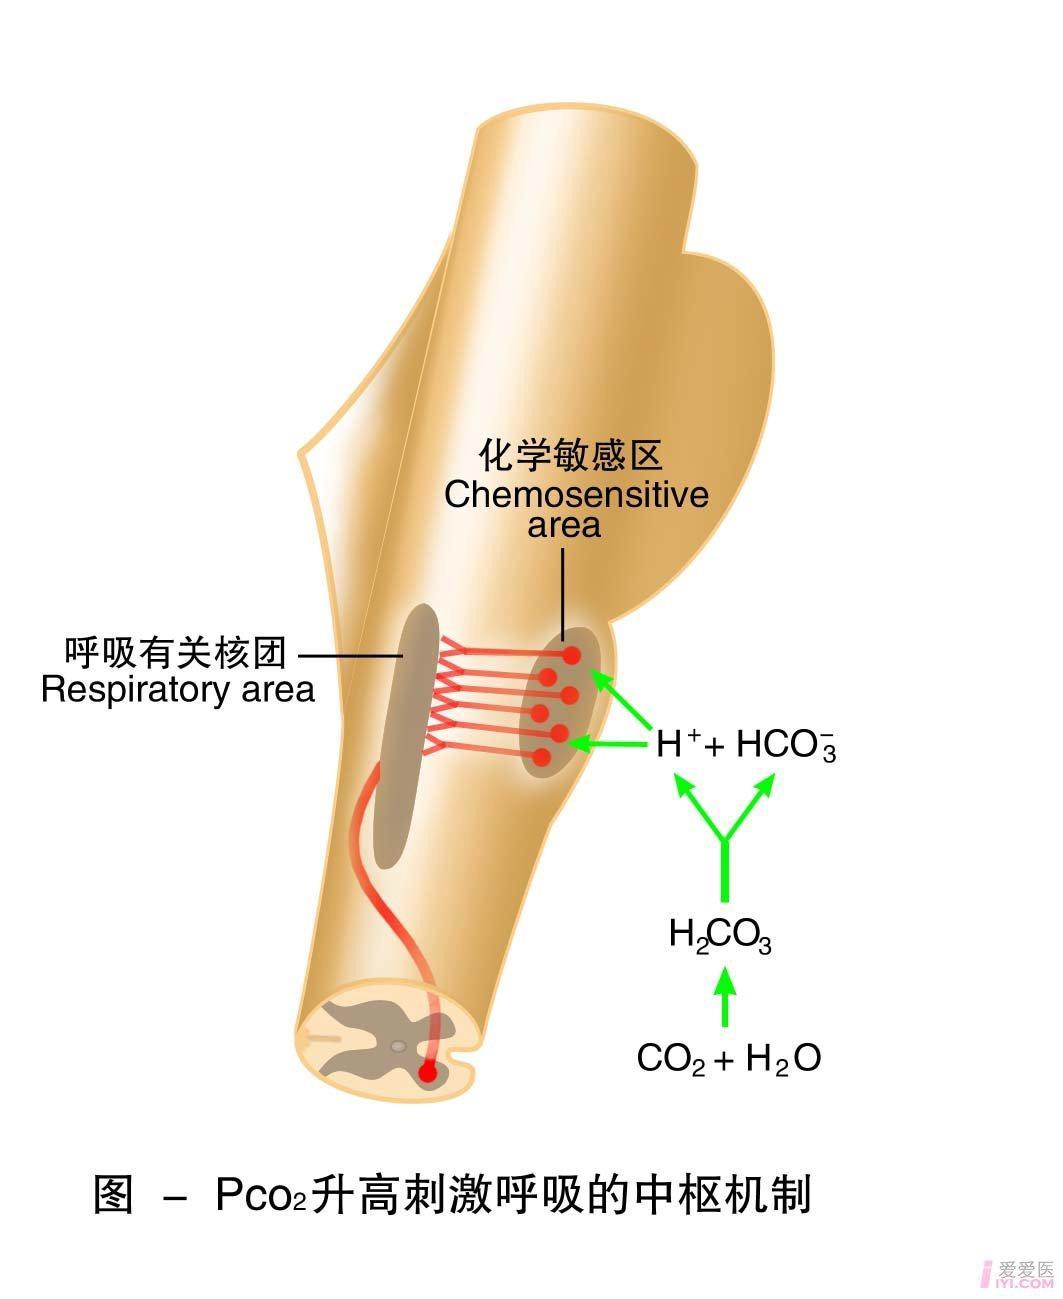 26-PCO2升高刺激呼吸的中枢机制.jpg